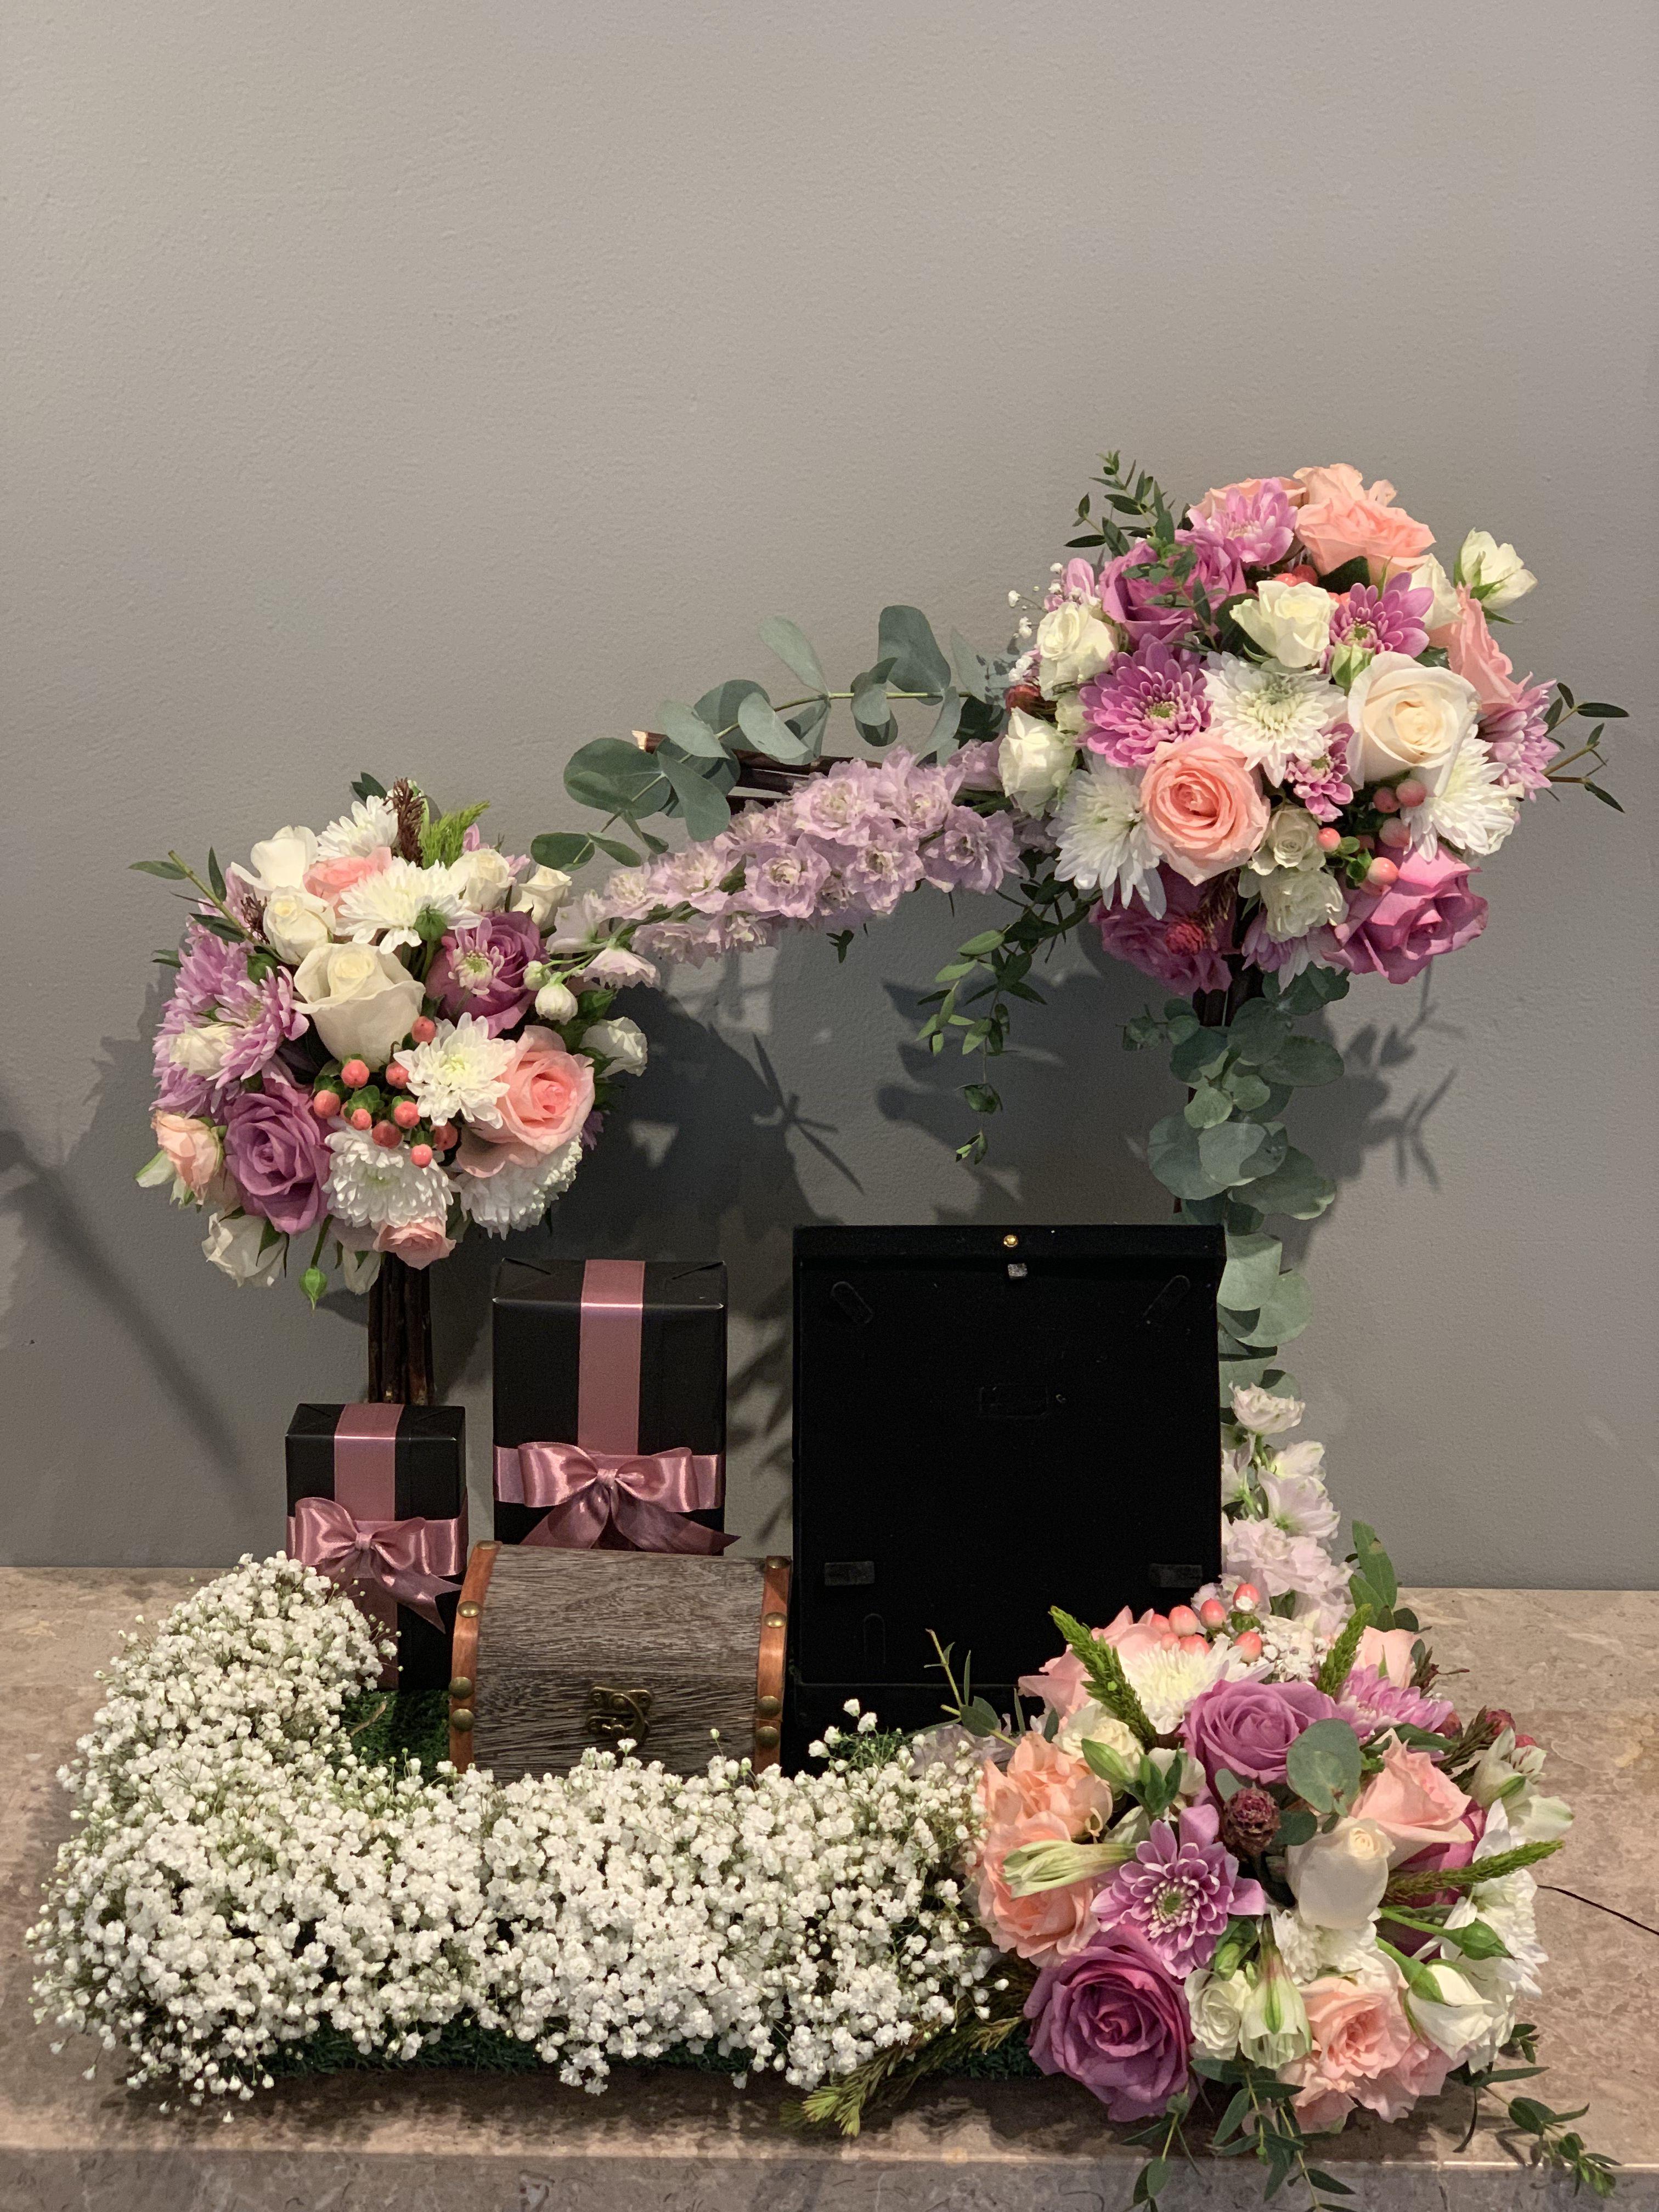 Arrangement شبكه Wedding Arrangements Flowers Flowers Bouquet